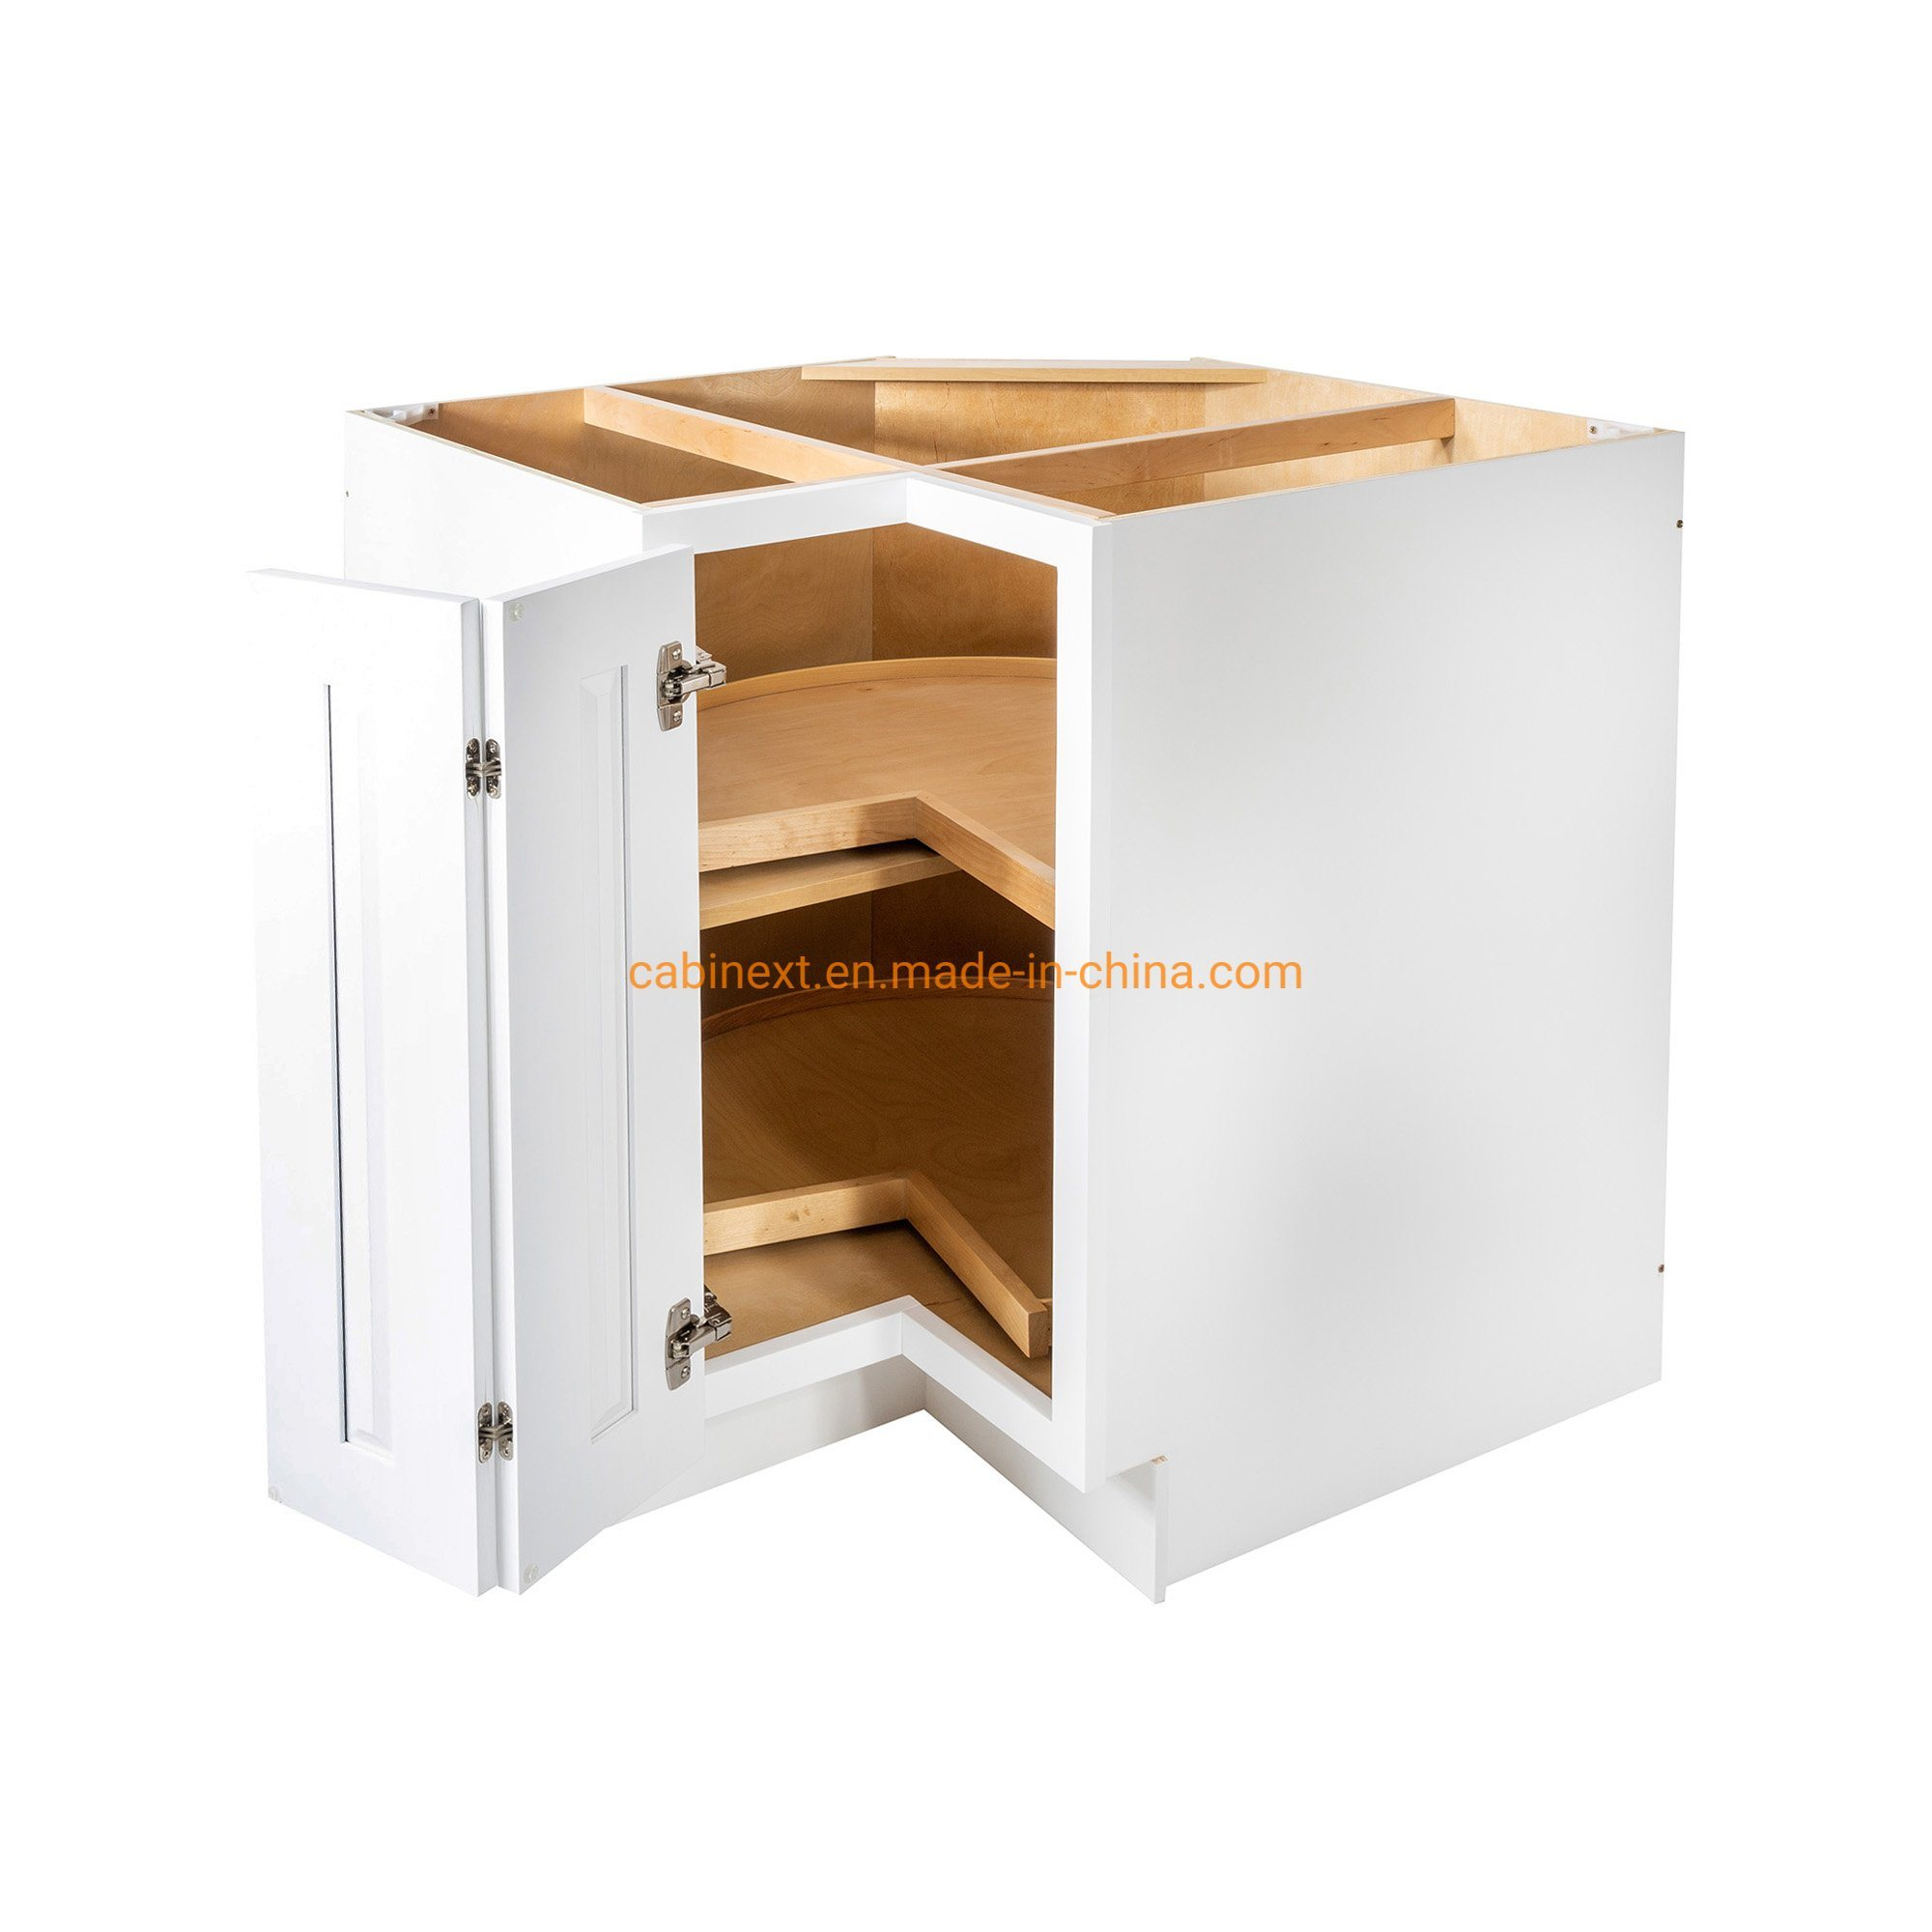 China White Floor Kitchen Cabinet Corner Sink Base Drawer For Sale China Modern Kitchen Cabinet Wooden Cabinet